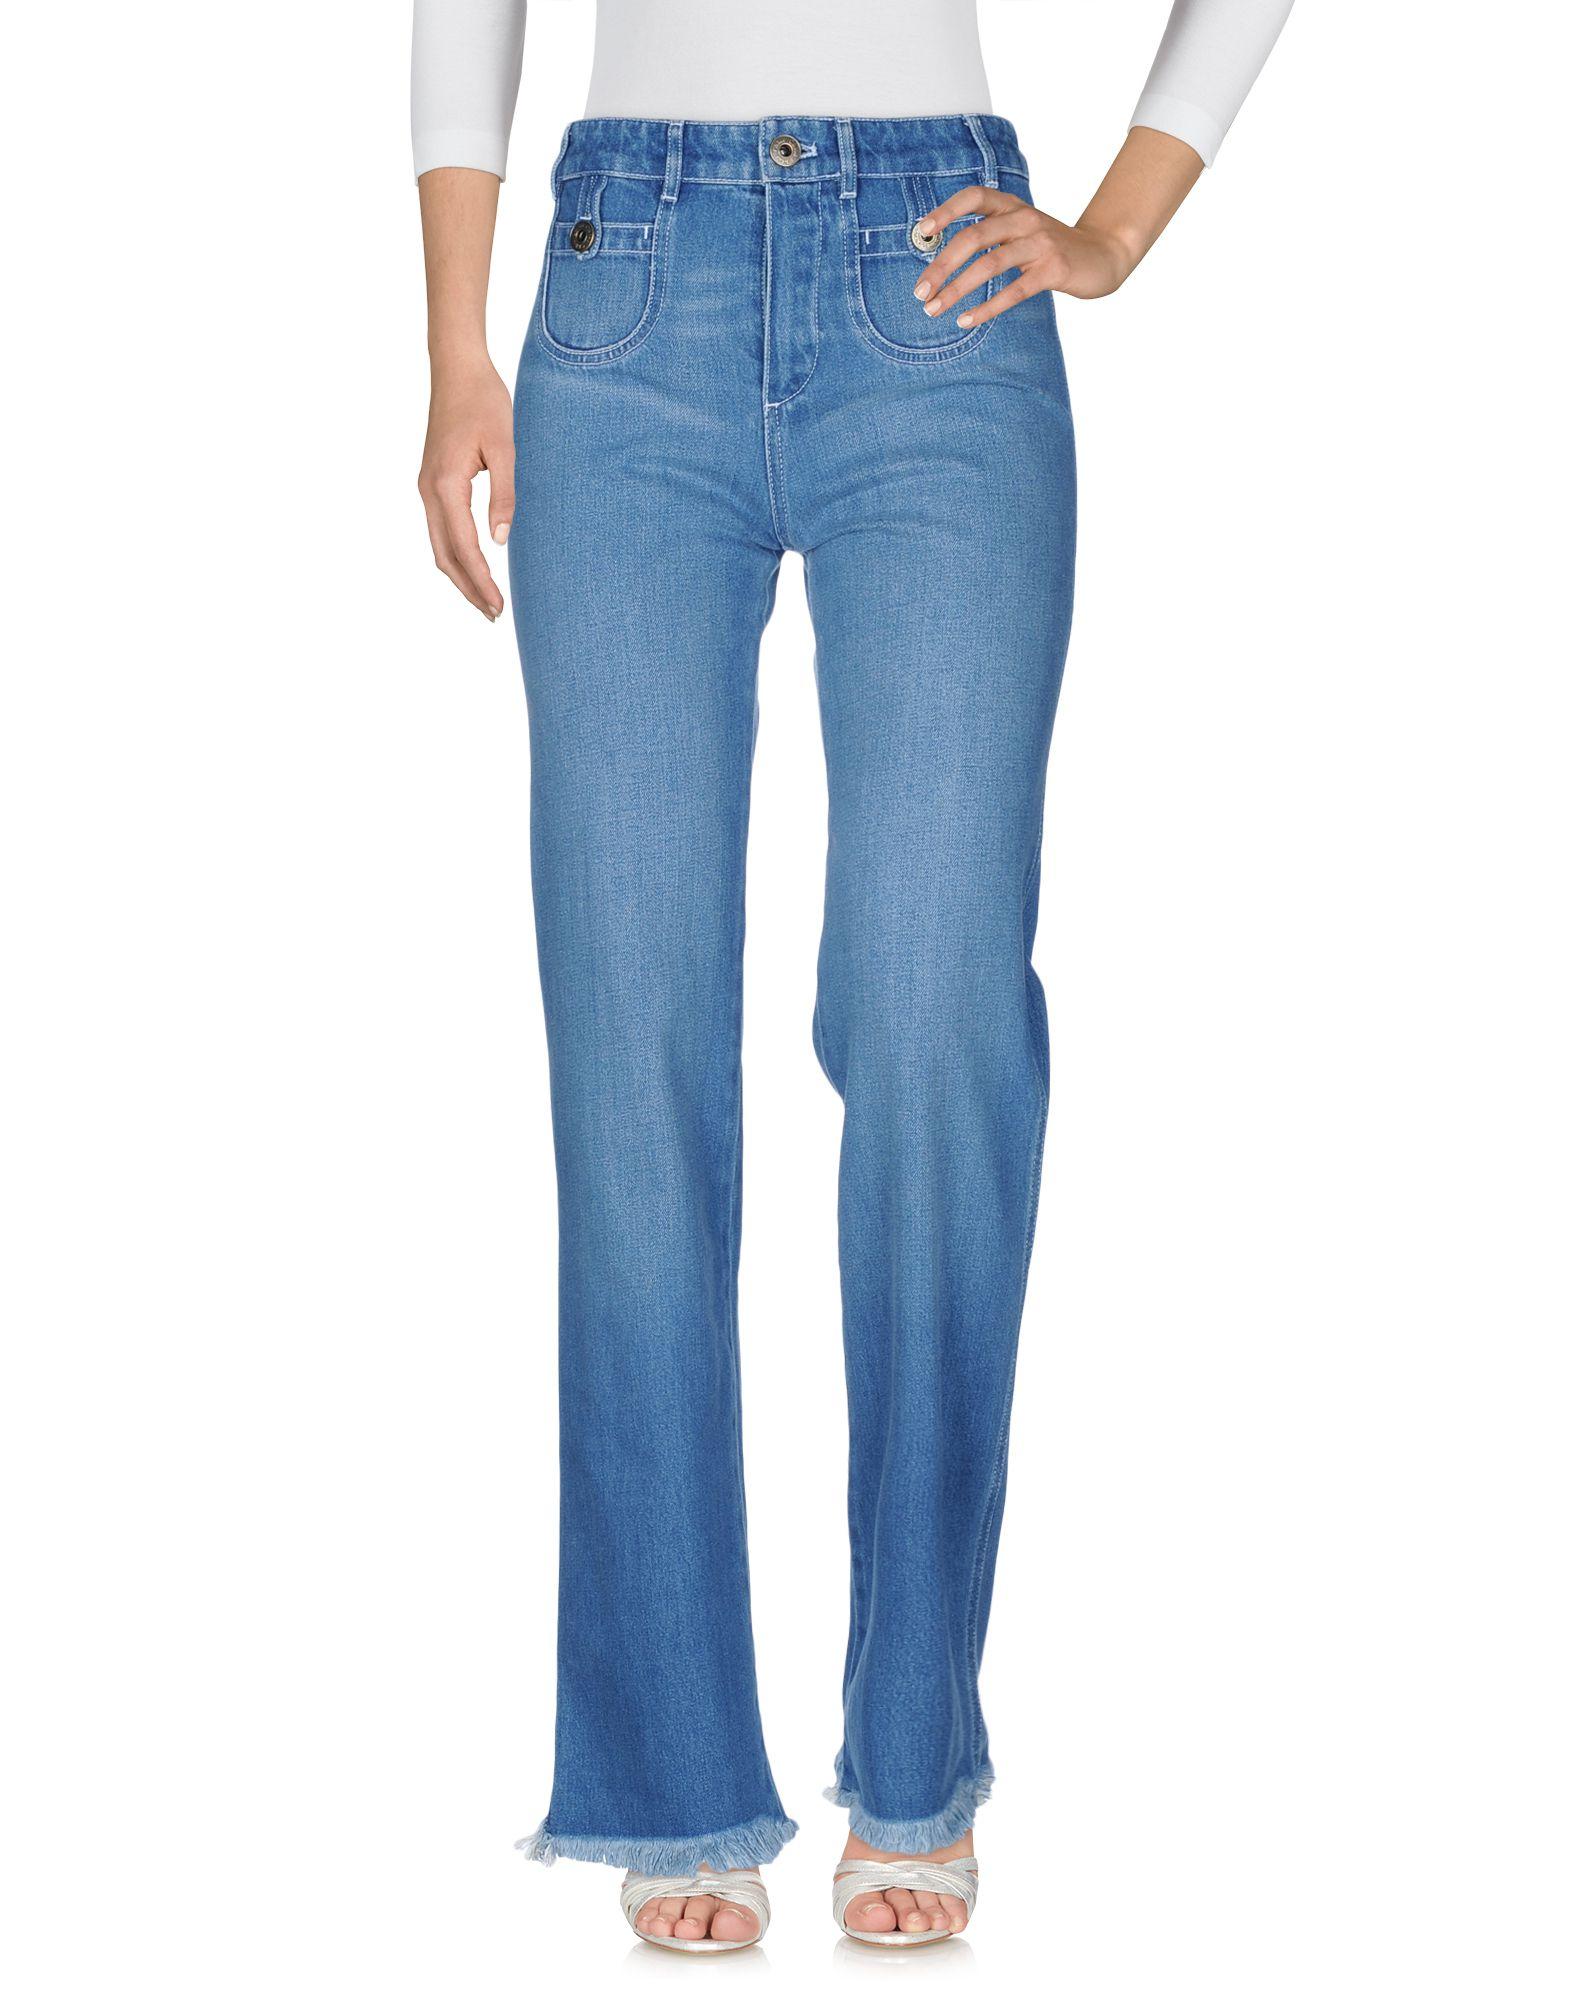 Pantaloni Jeans Chloé Donna - Acquista online su 6Kz5i